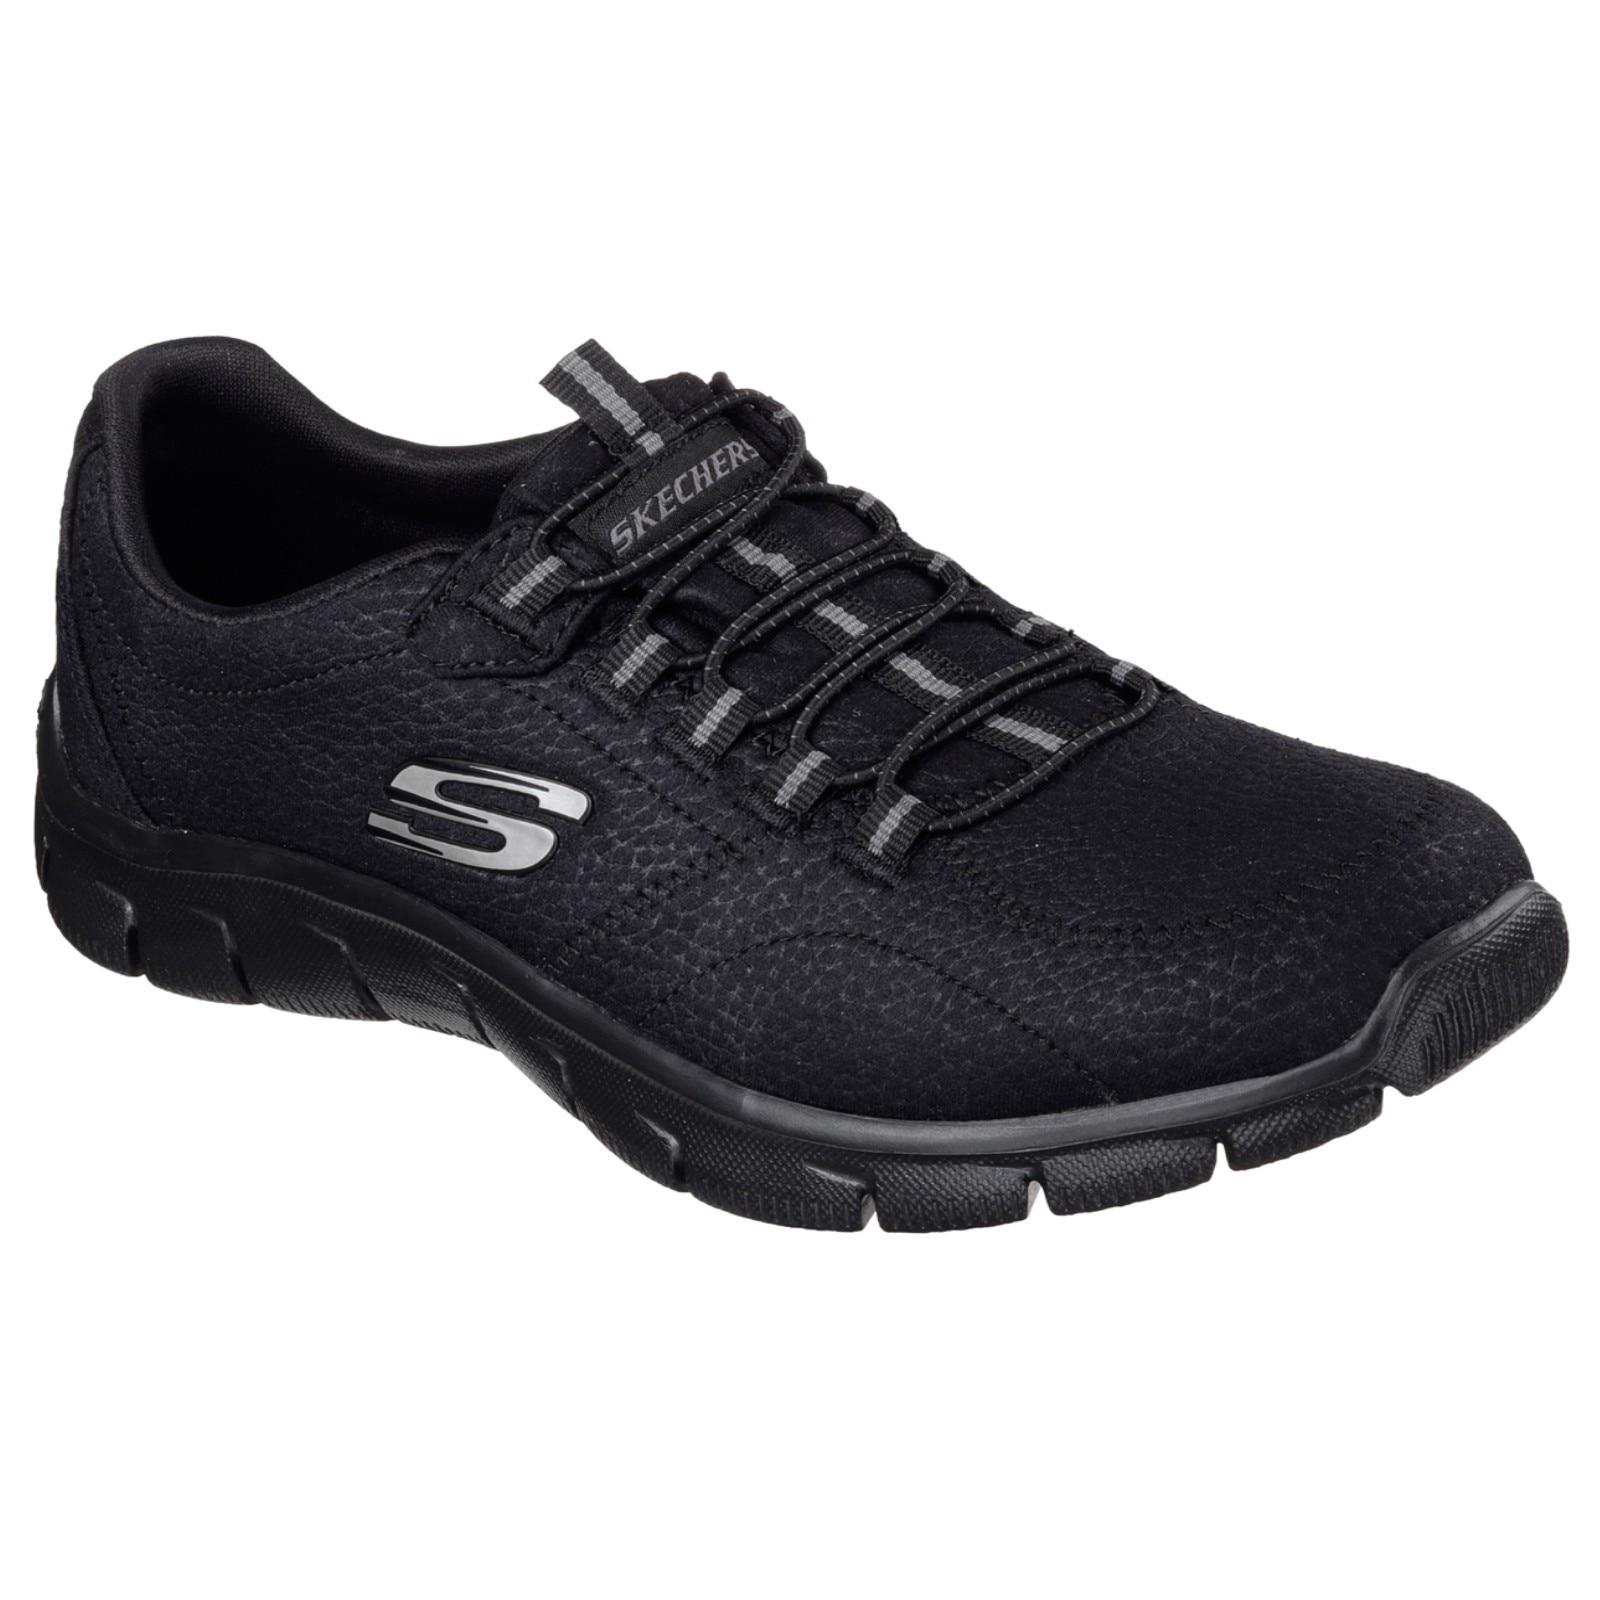 04074 Skechers női sportcipő 12407_BBK Relaxed Fit: Empire